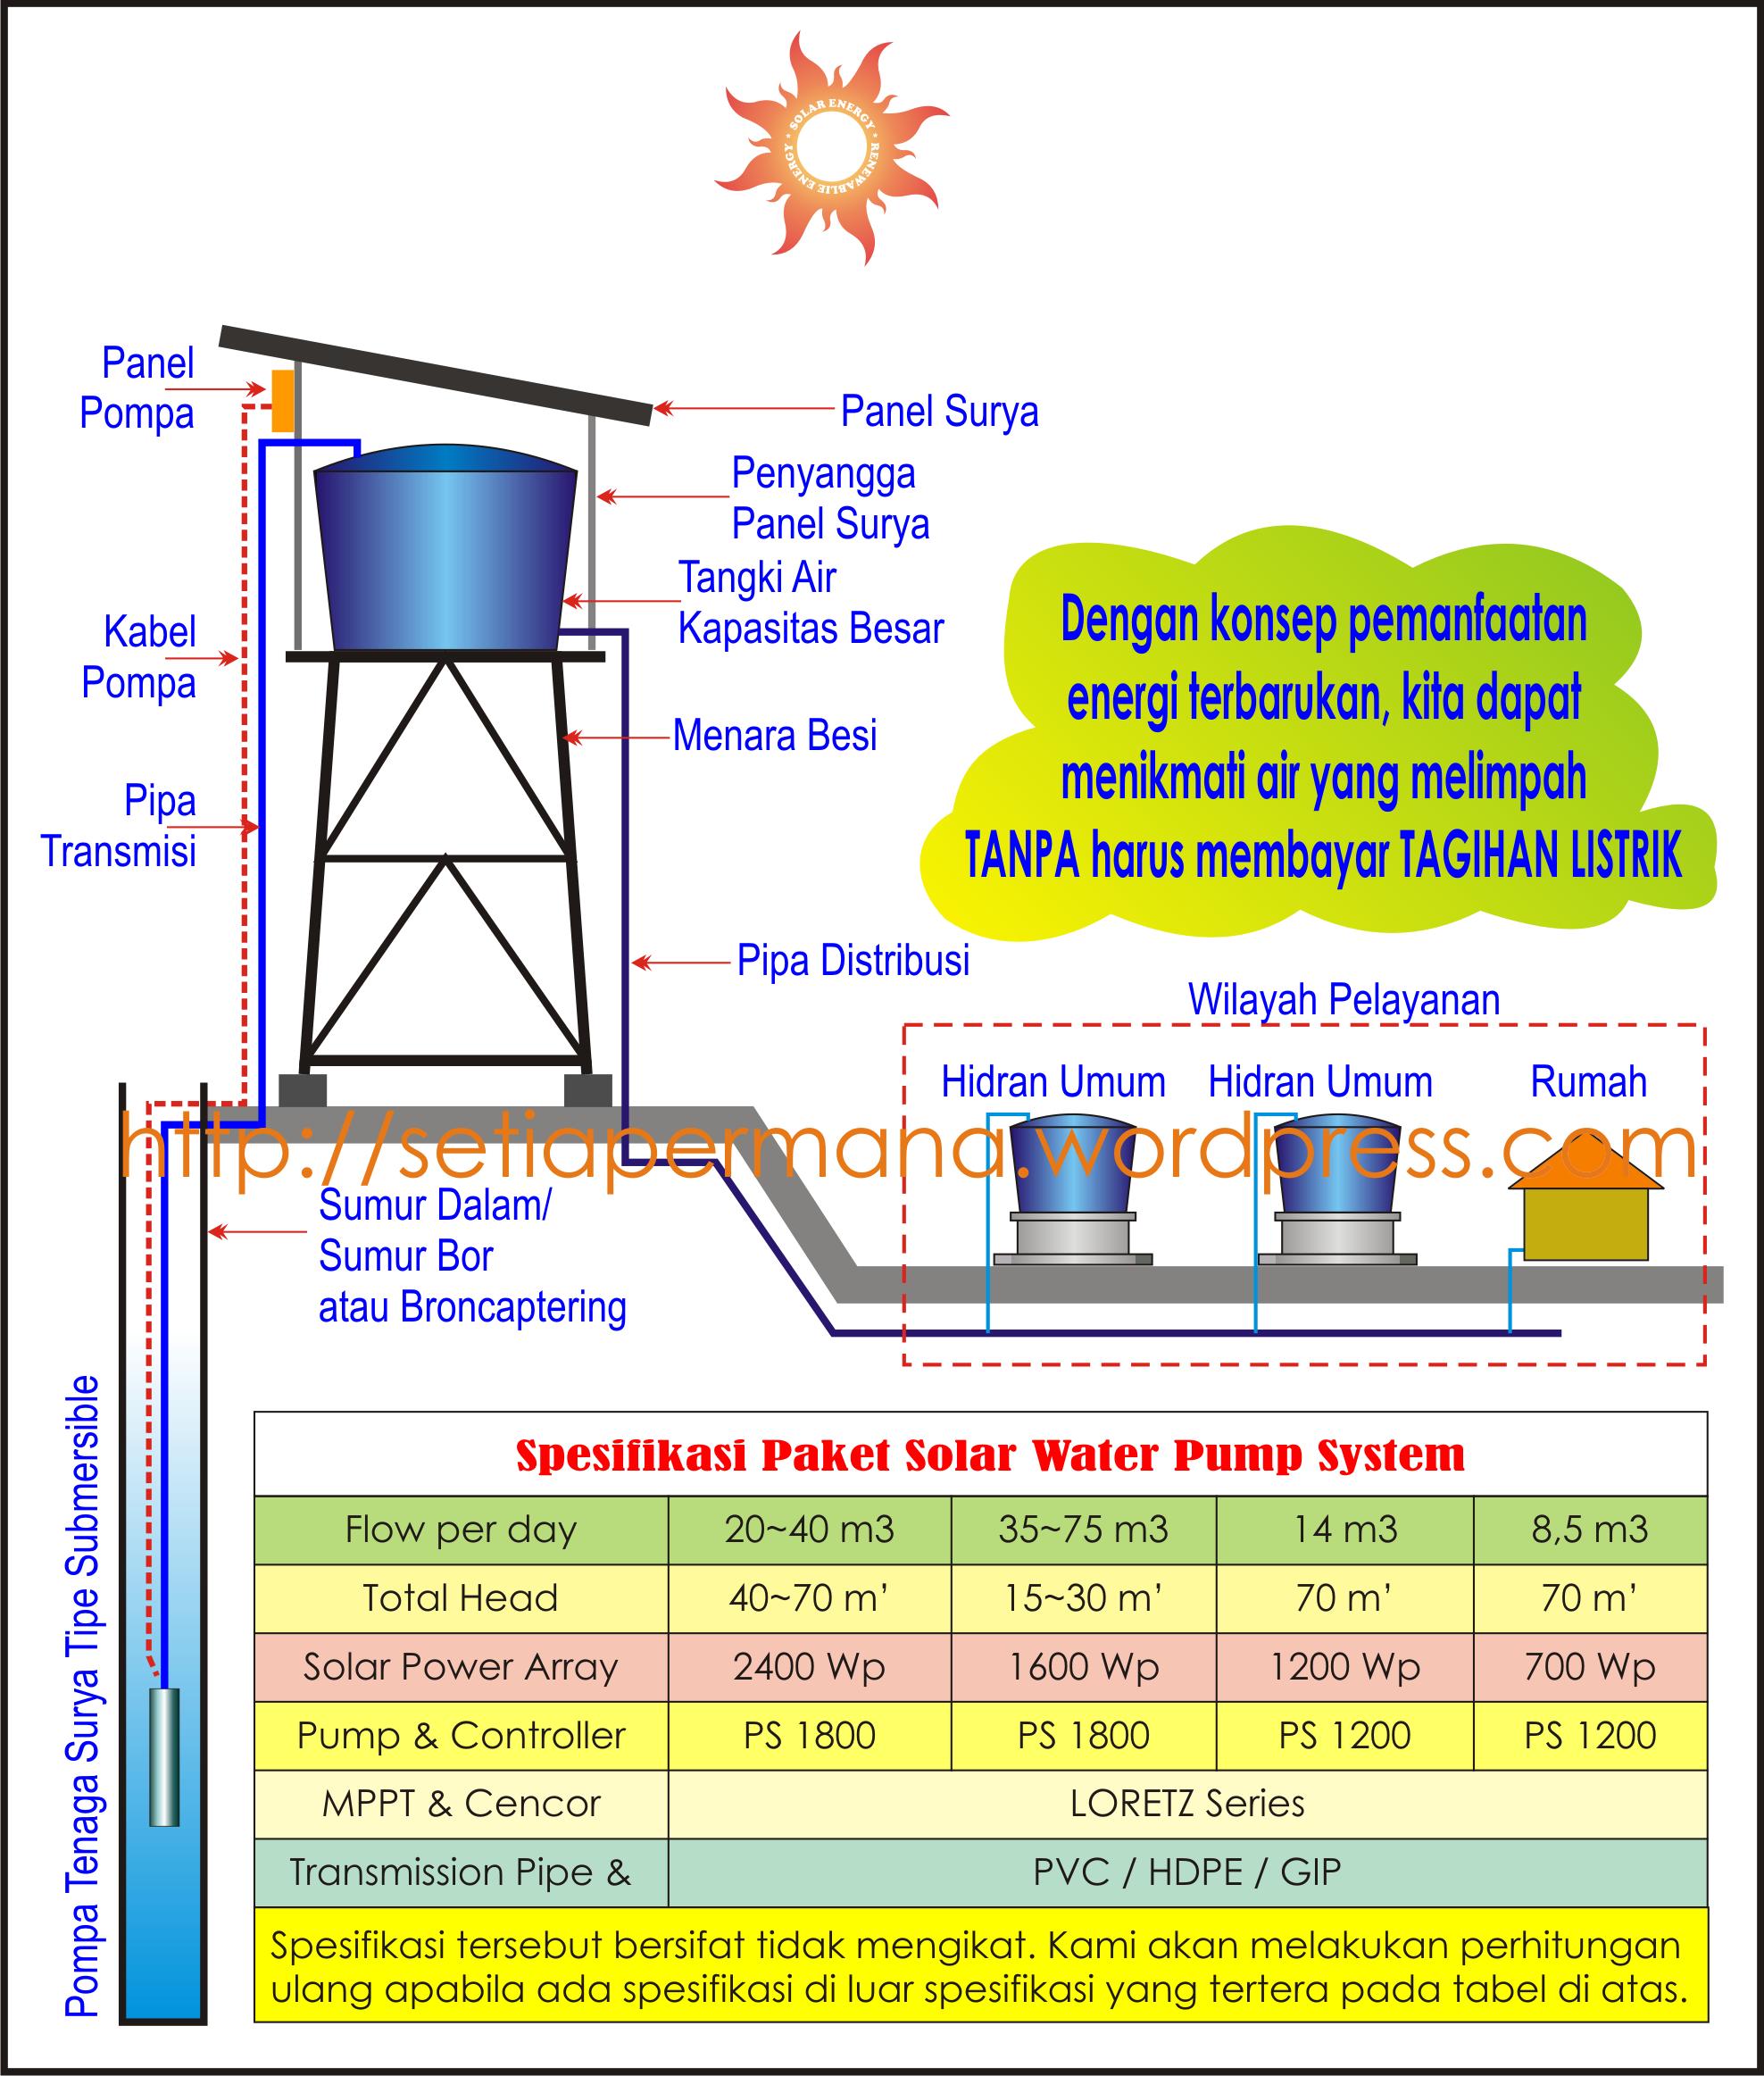 Solar water pump system pompa air tenaga surya peaceful of my life setiapermanaleswordpr ccuart Choice Image